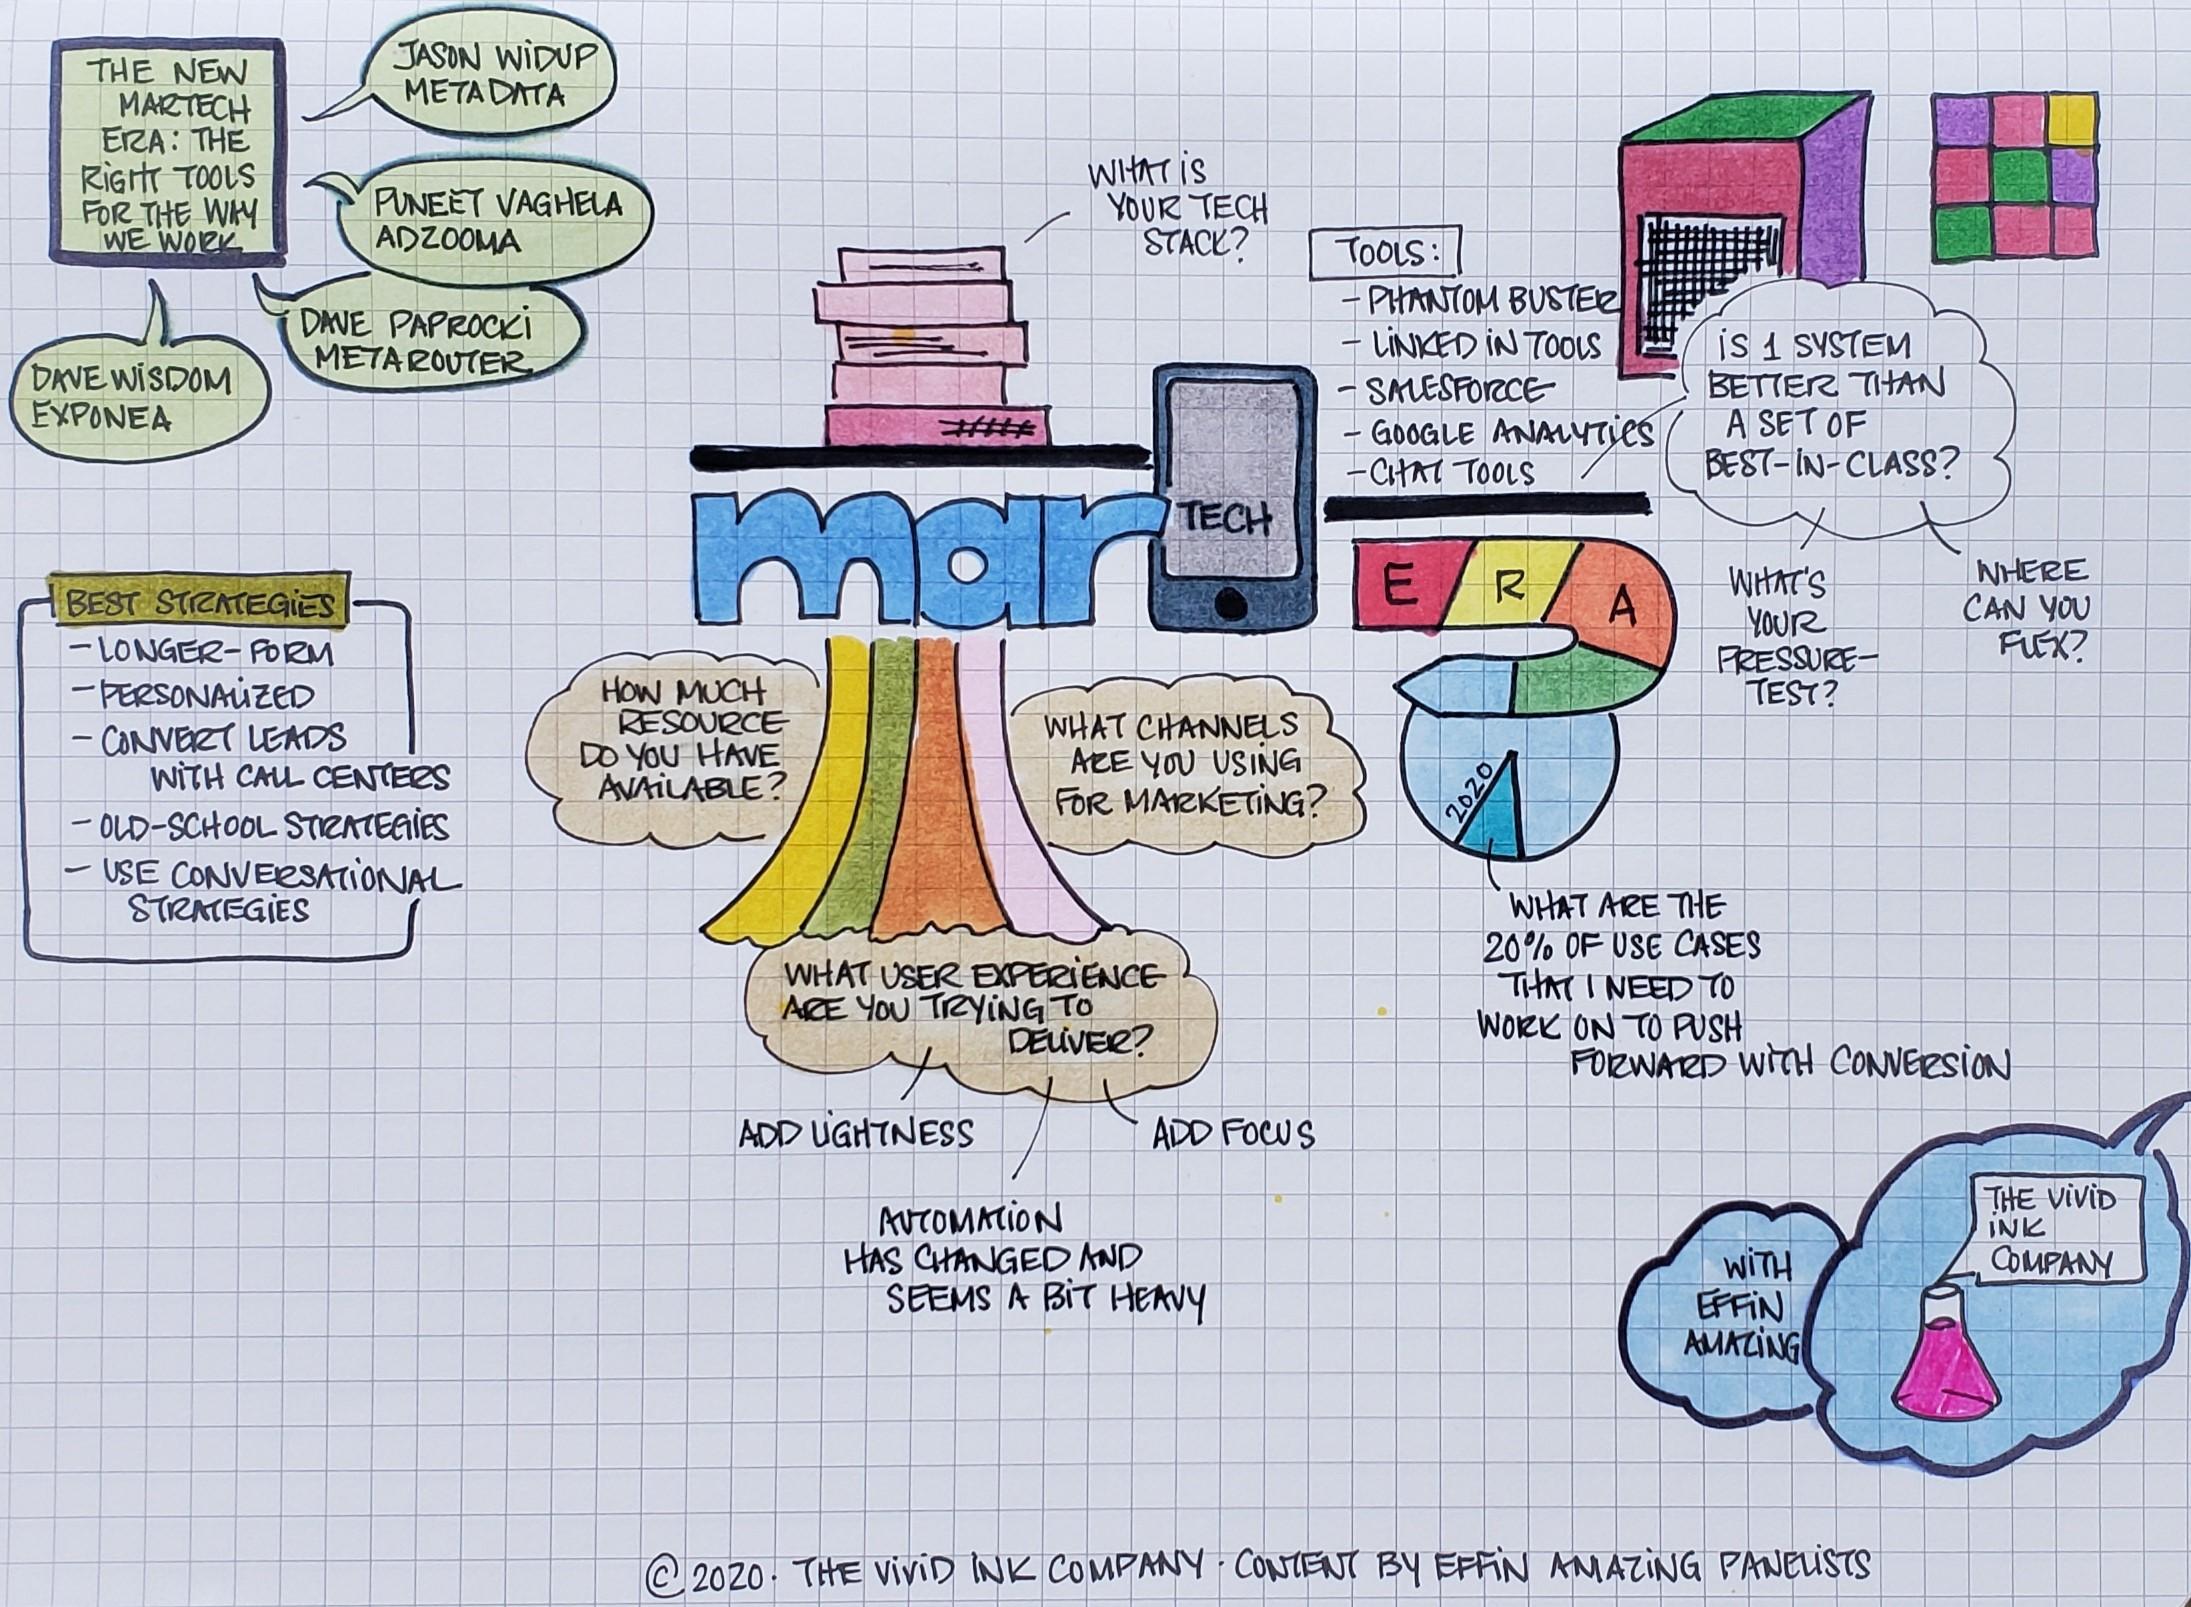 The New Martech Era Visual Notes